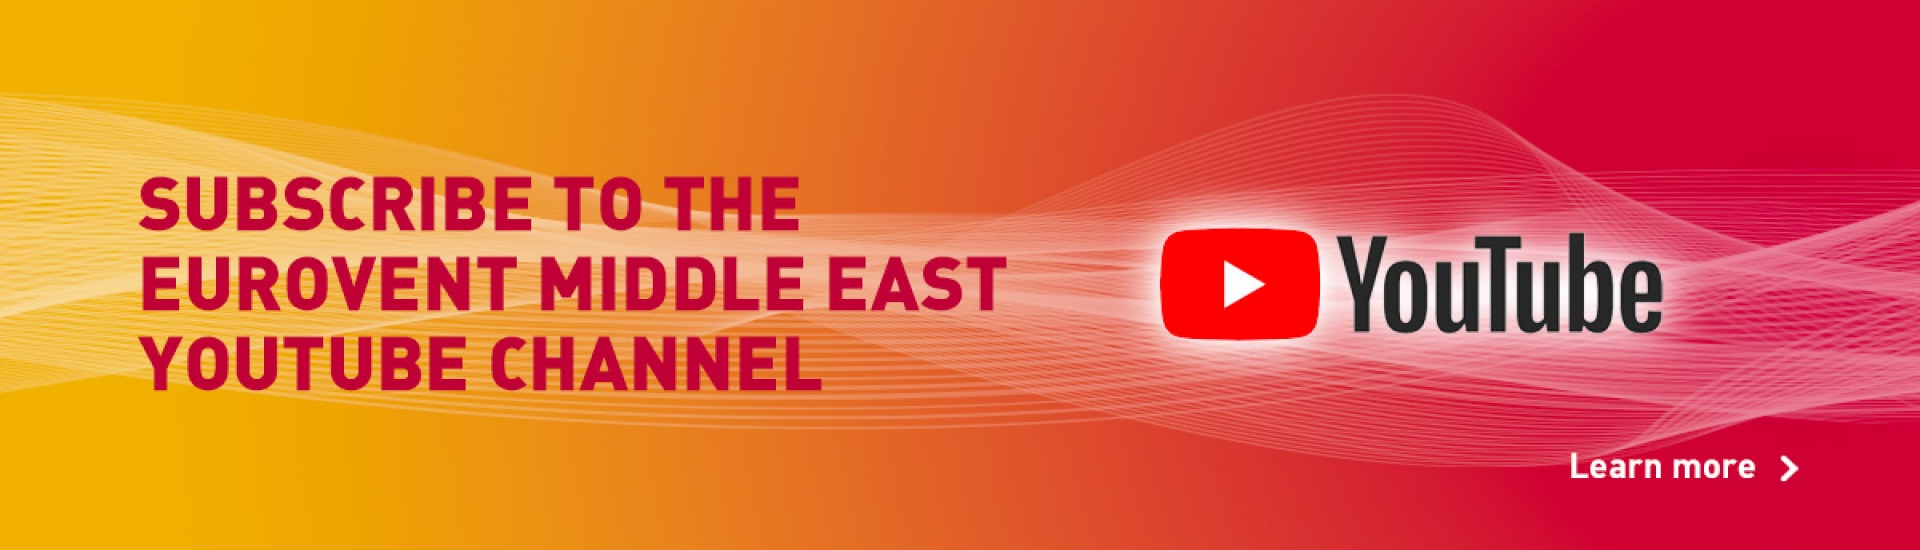 2020 - EME YouTube channel